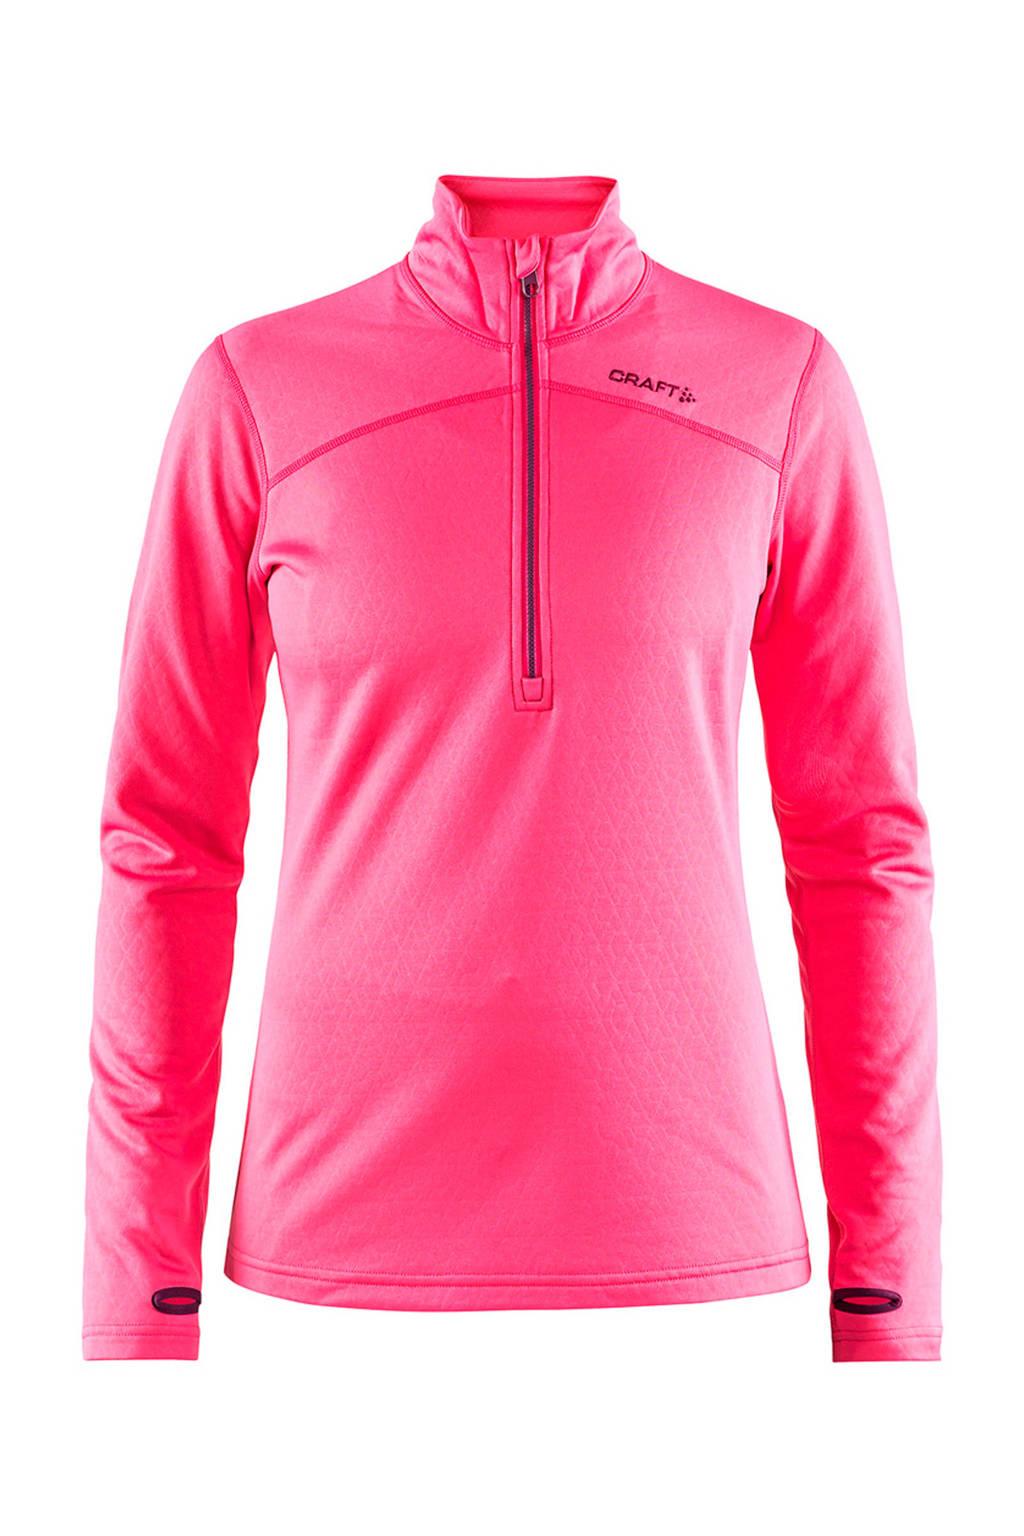 Craft sportsweater roze, Roze